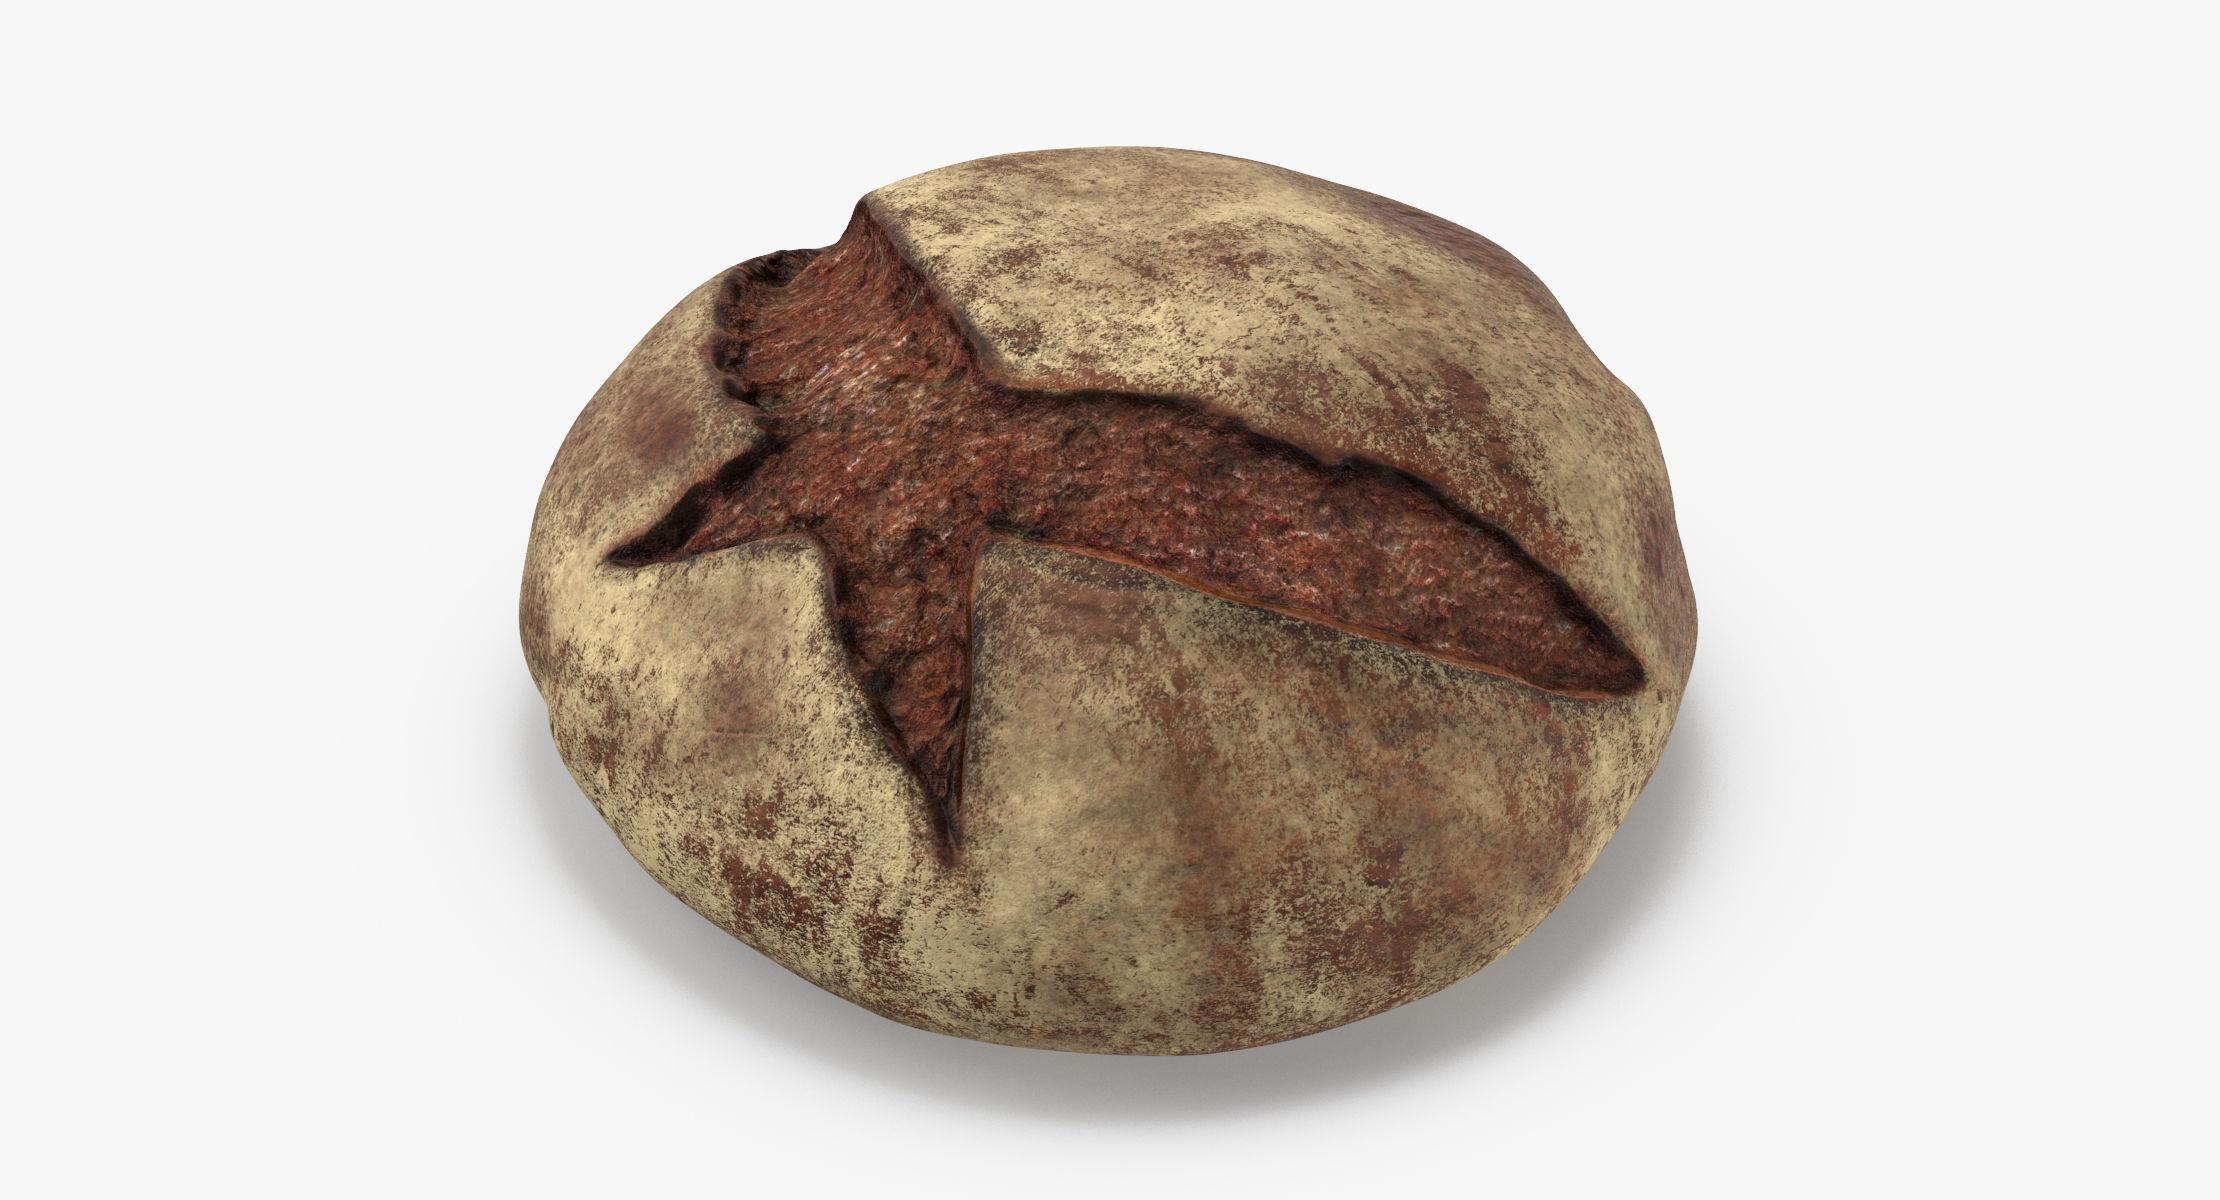 Bread Loaf 05 - reel 1